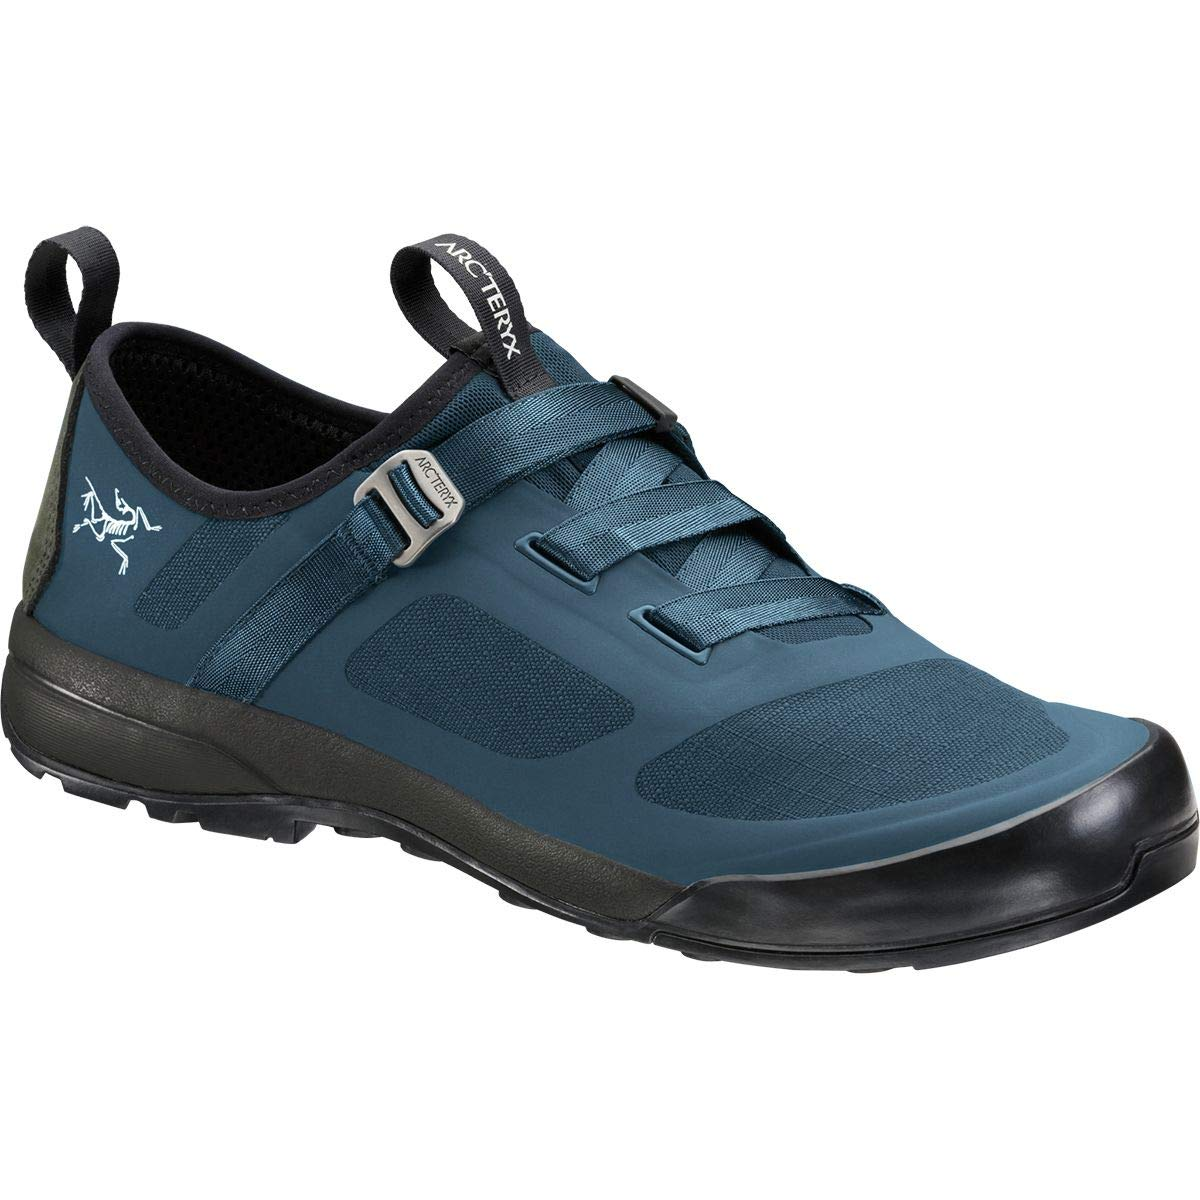 Arcteryx Mens Arakys Approach Shoe